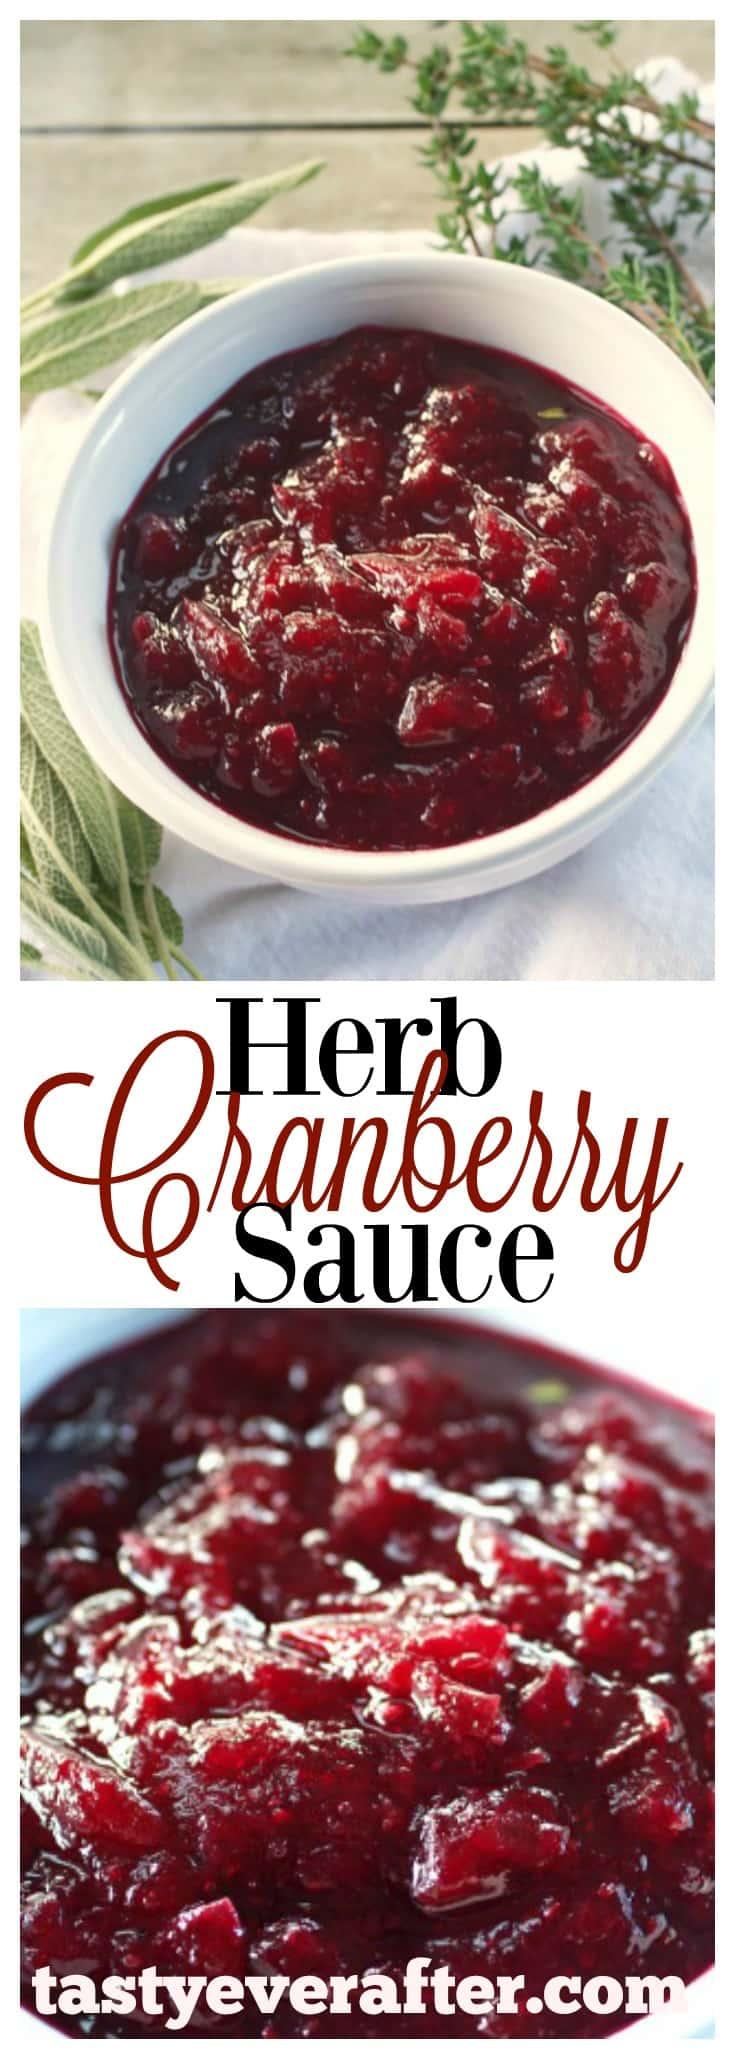 Herb Cranberry Sauce